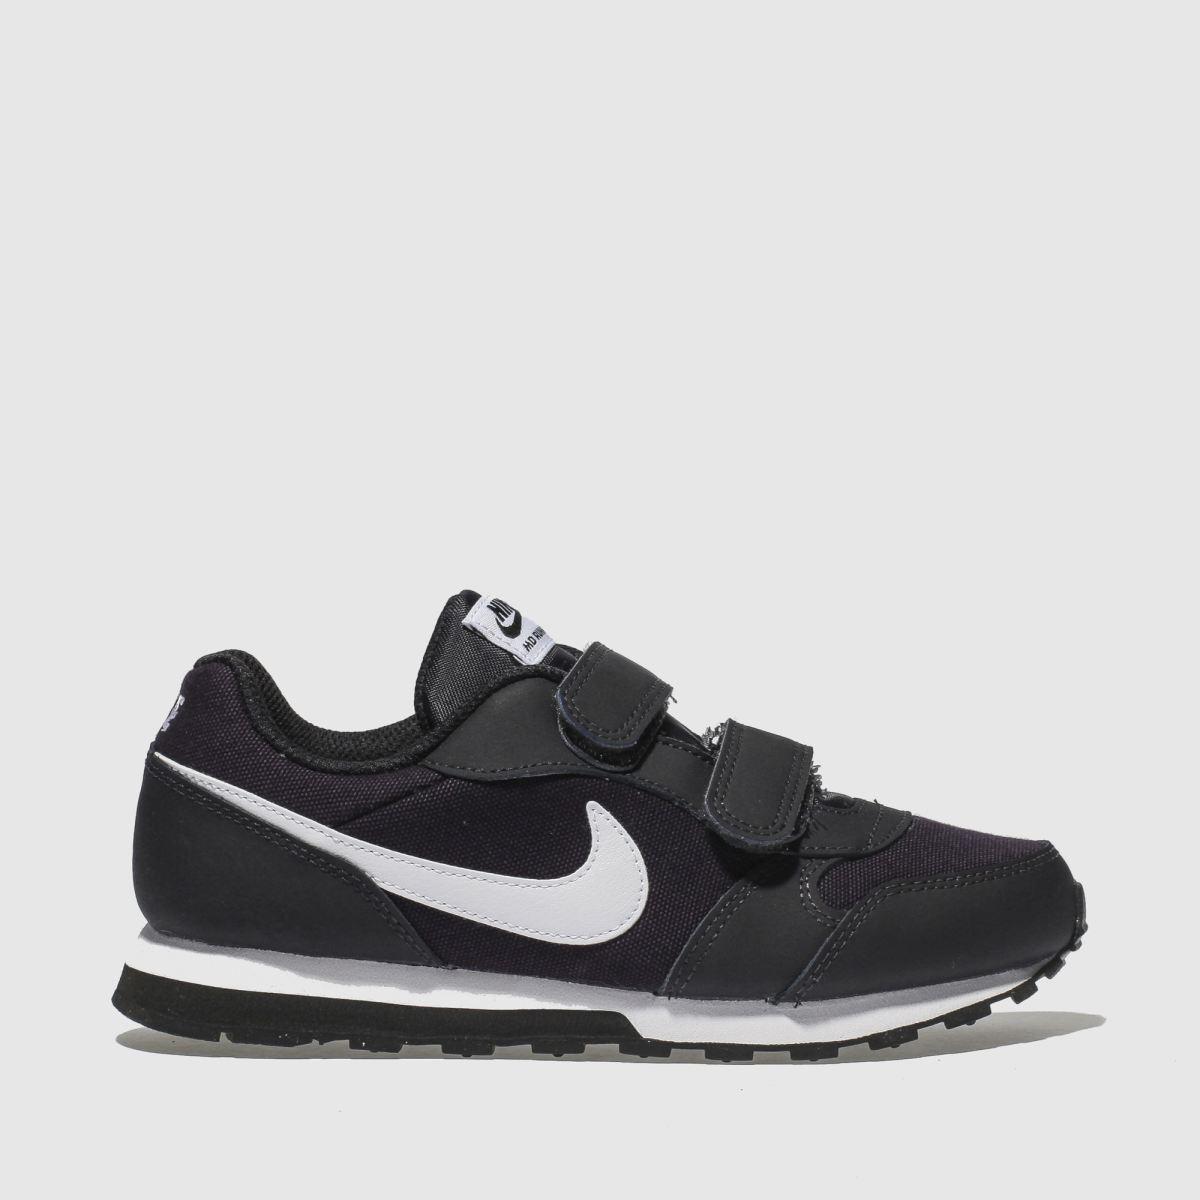 Nike Navy Md Runner 2 Trainers Junior